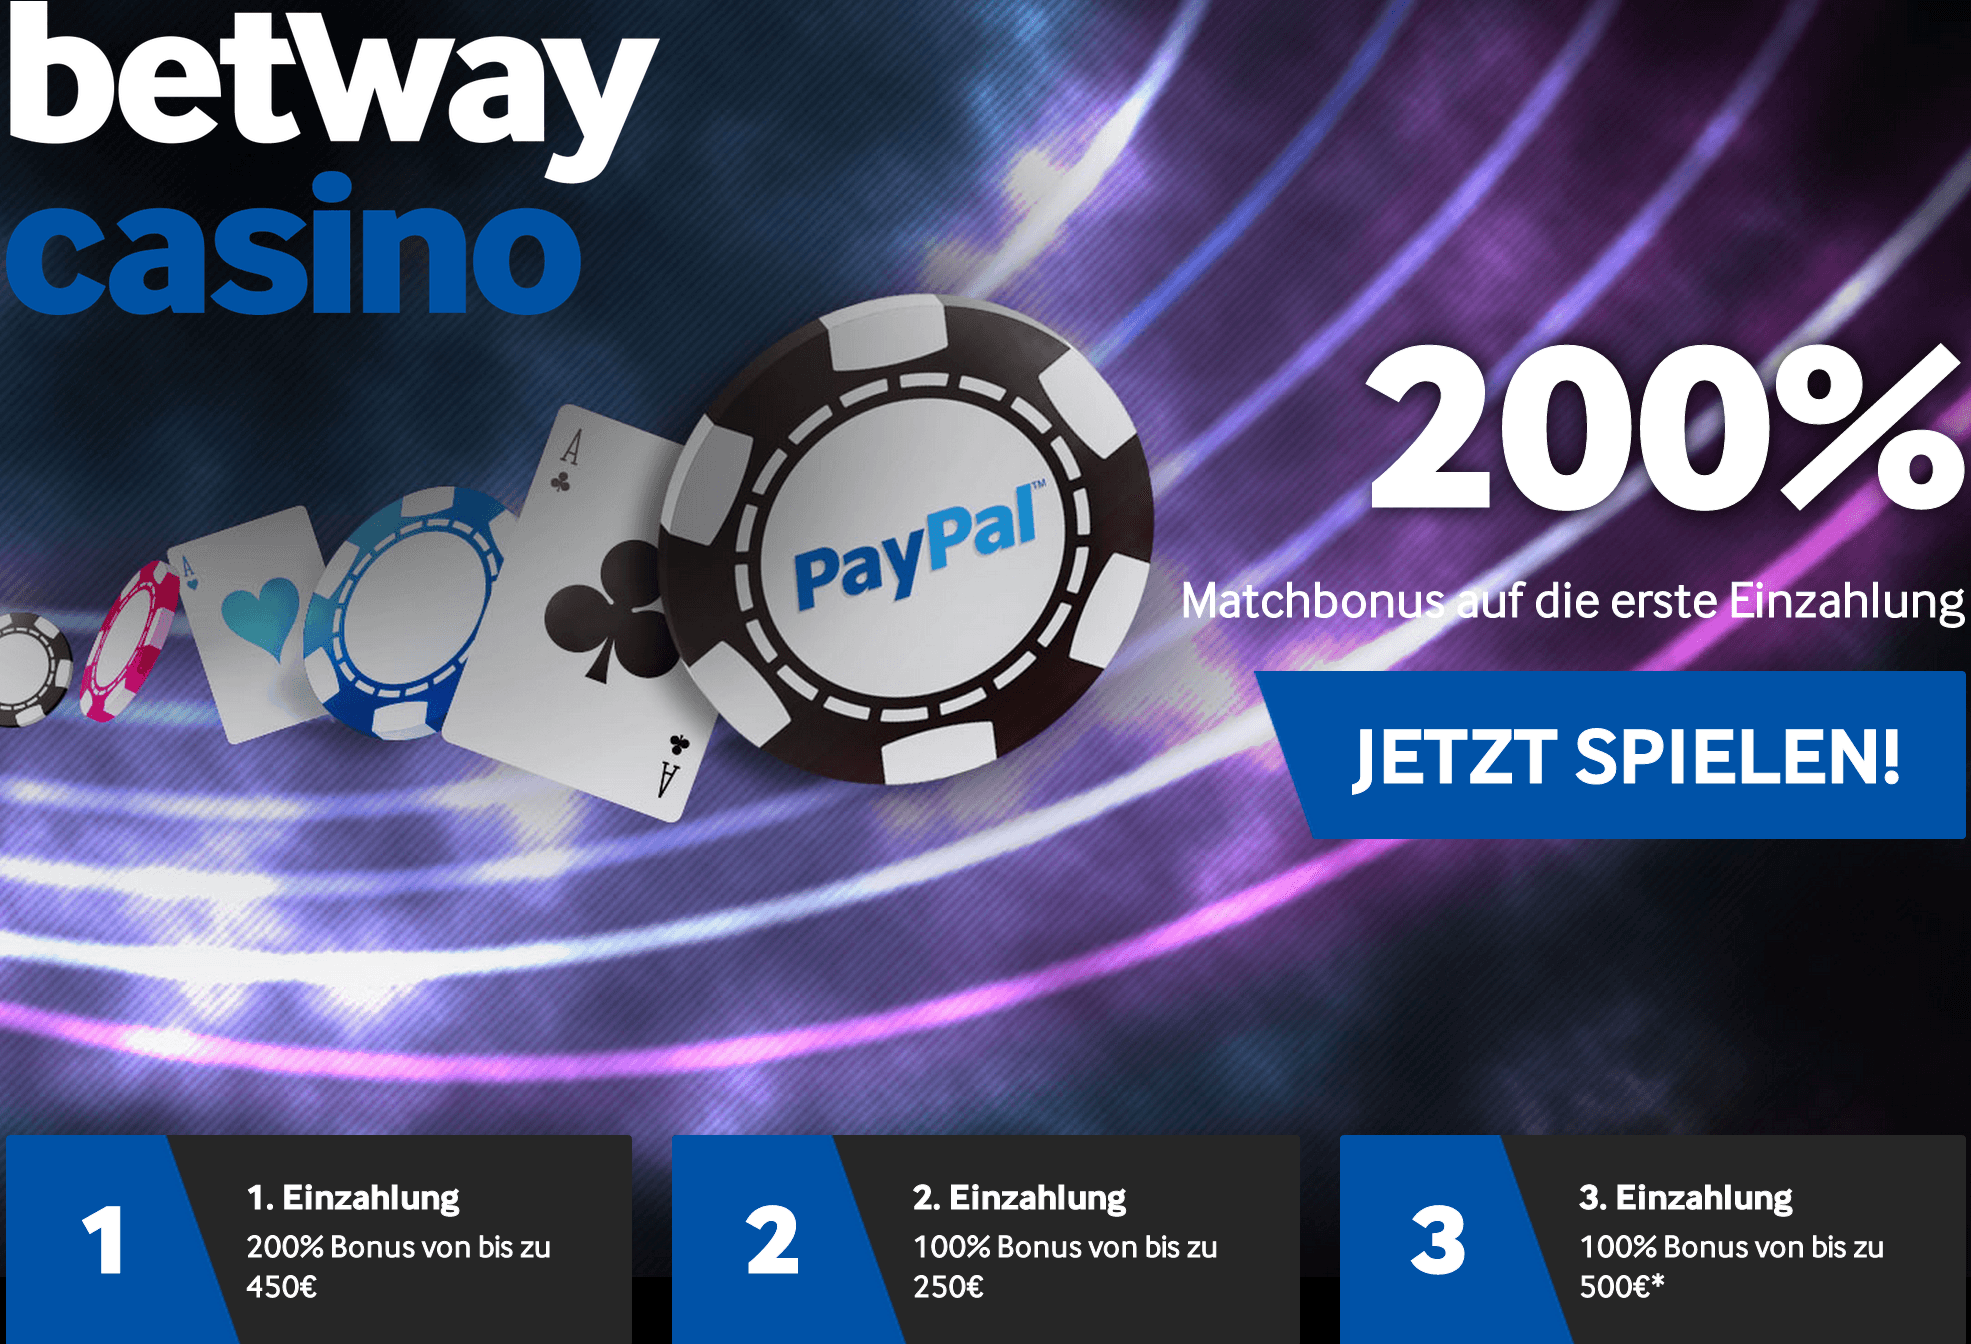 betway casino online blackjack spiel